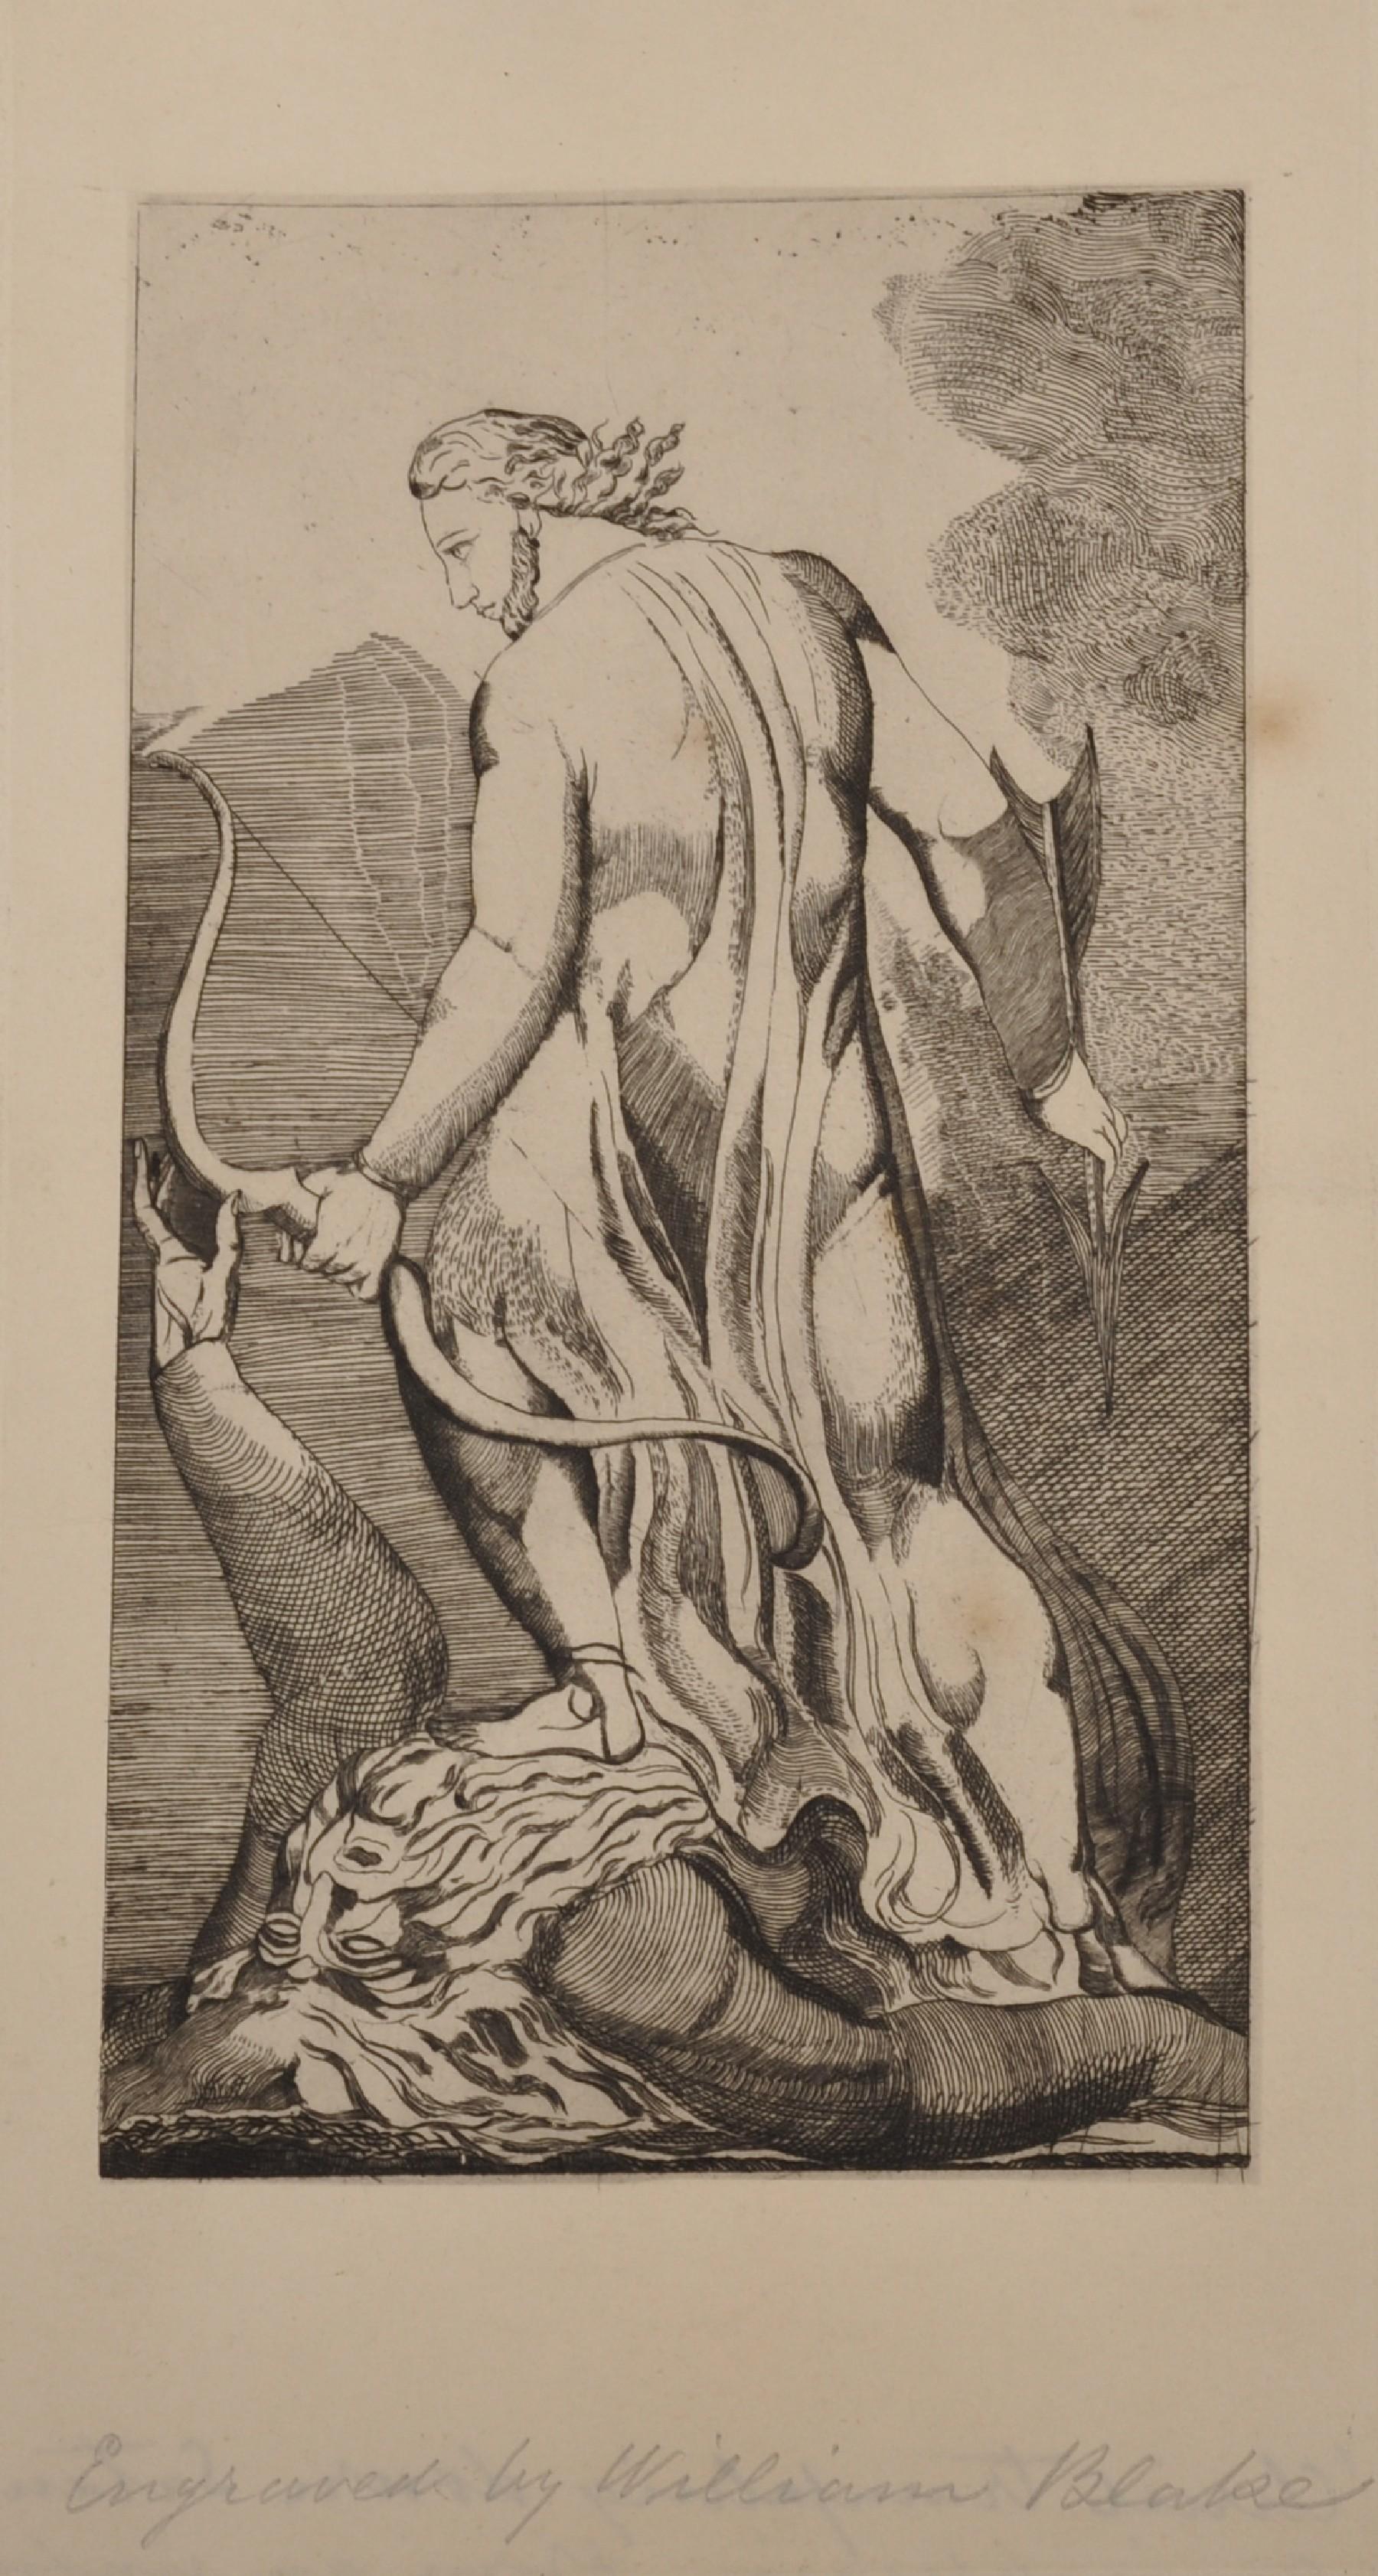 "After William Blake (1757-1827) British. ""Christ Trampling on Satan"", Engraving, Inscribed in"